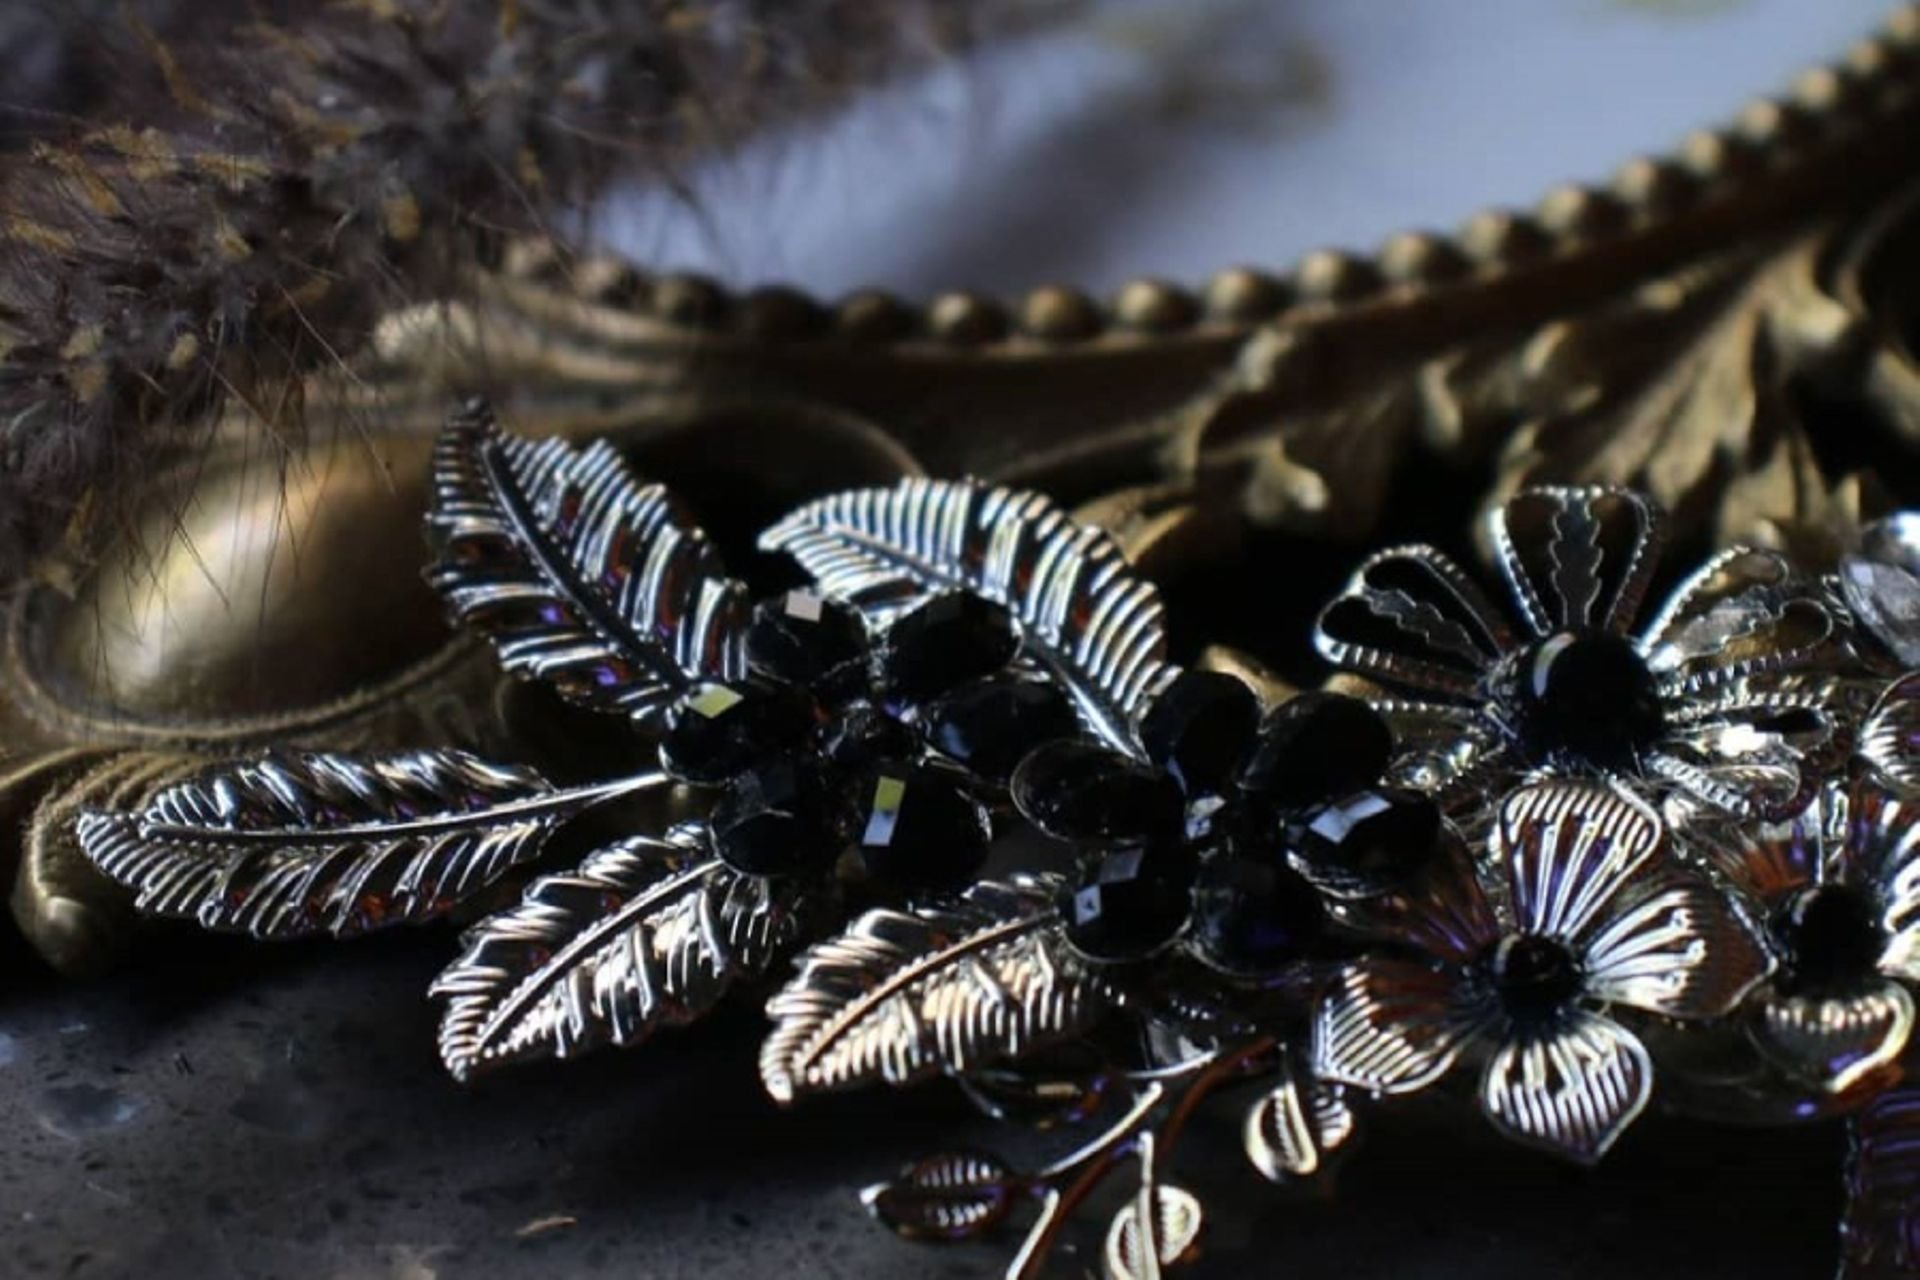 43 lantana beads jewelry designer תְמוּנָה